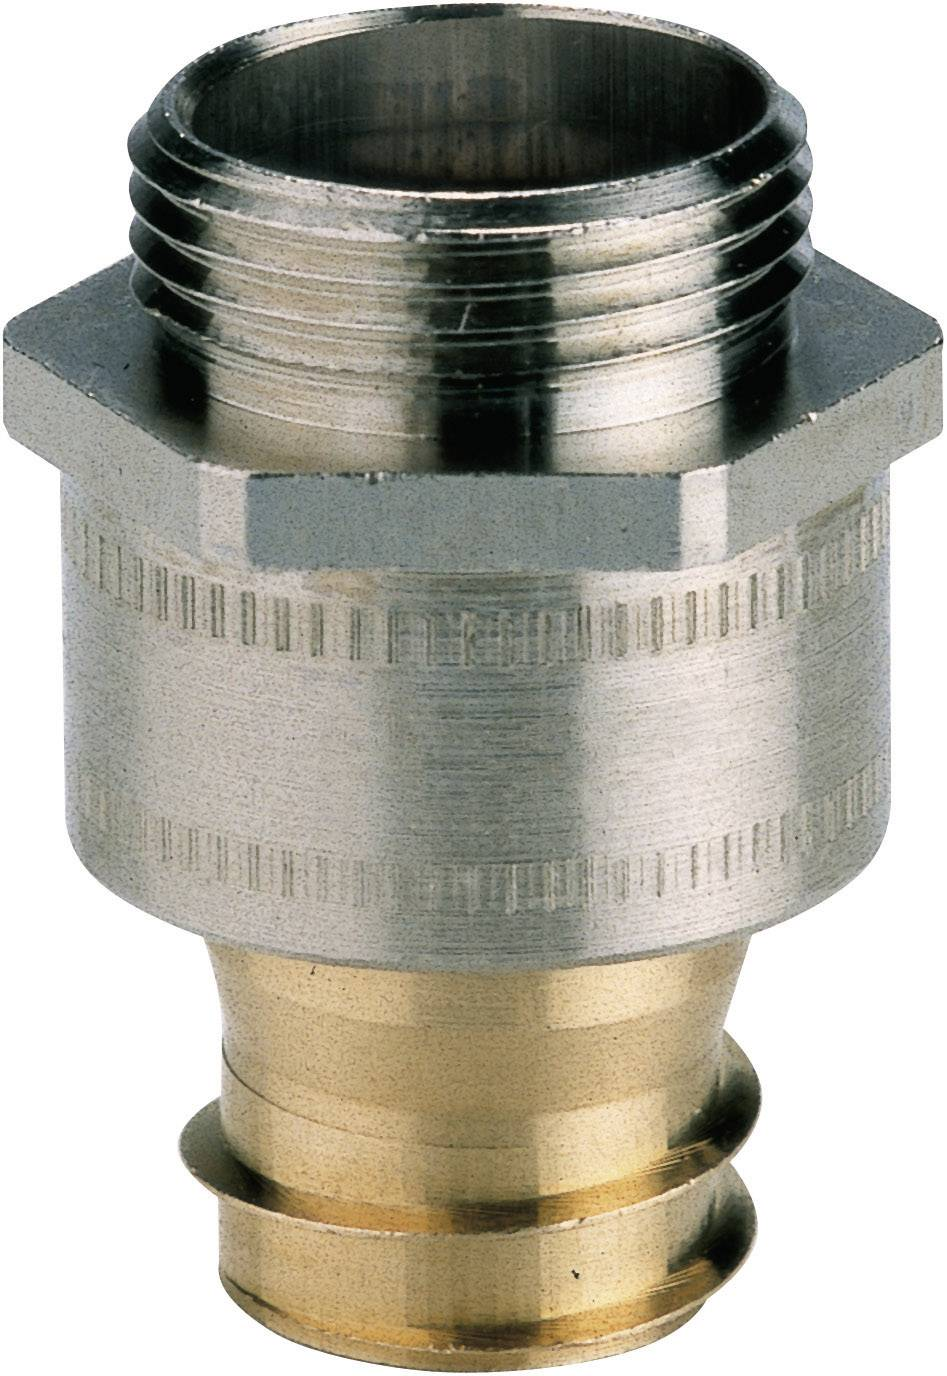 Šroubový spoj kovový LappKabel SILVYN LI-M 20x1,5 SGY (61802372)